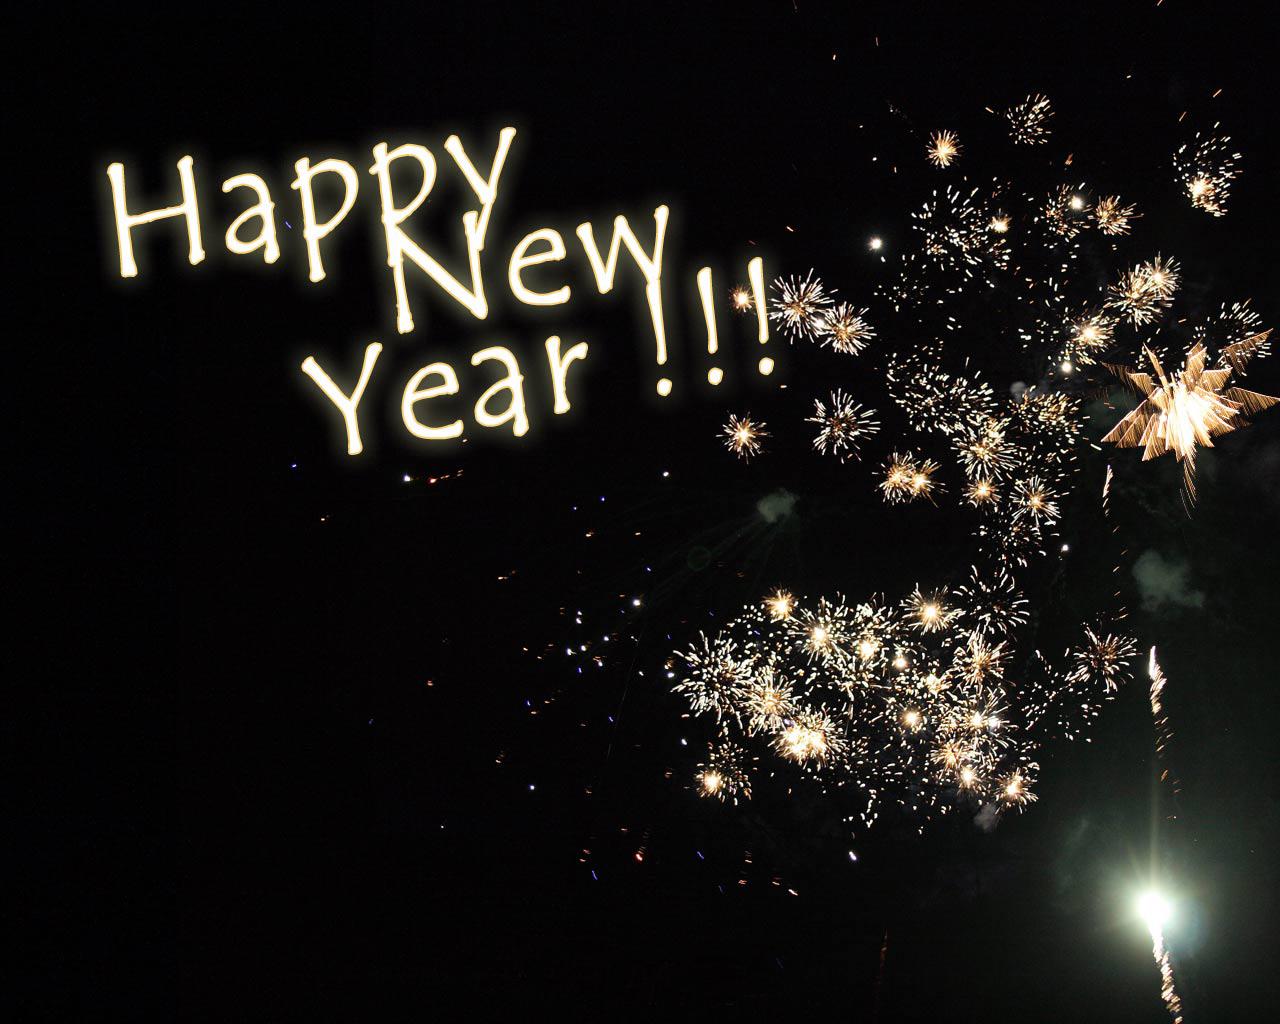 http://4.bp.blogspot.com/-WBckjbC9TwE/UKcpRFrXnwI/AAAAAAAAA28/8K3tuiLW-JU/s1600/new-year-wallpaper-2013-13.jpg